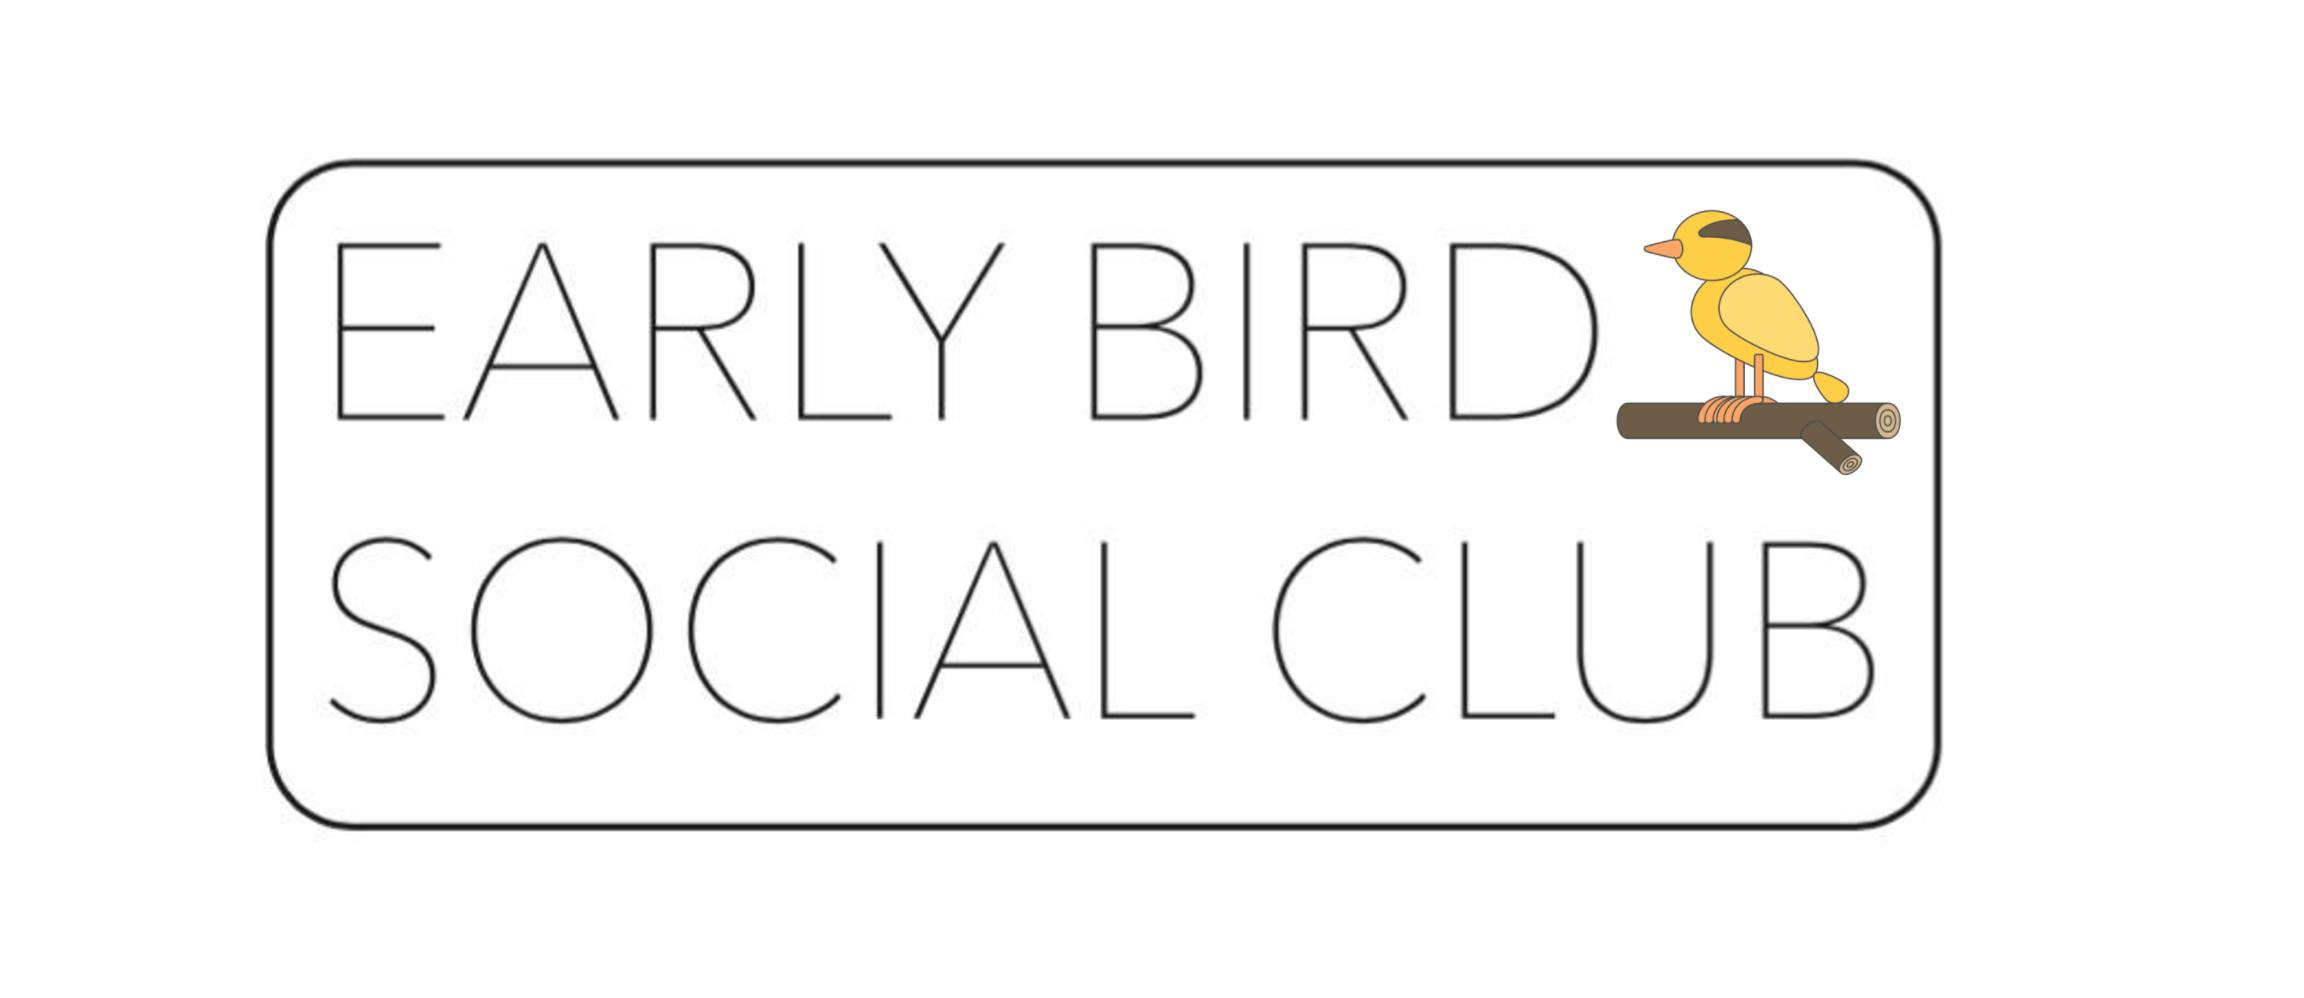 Early Bird Social Club in Hartford